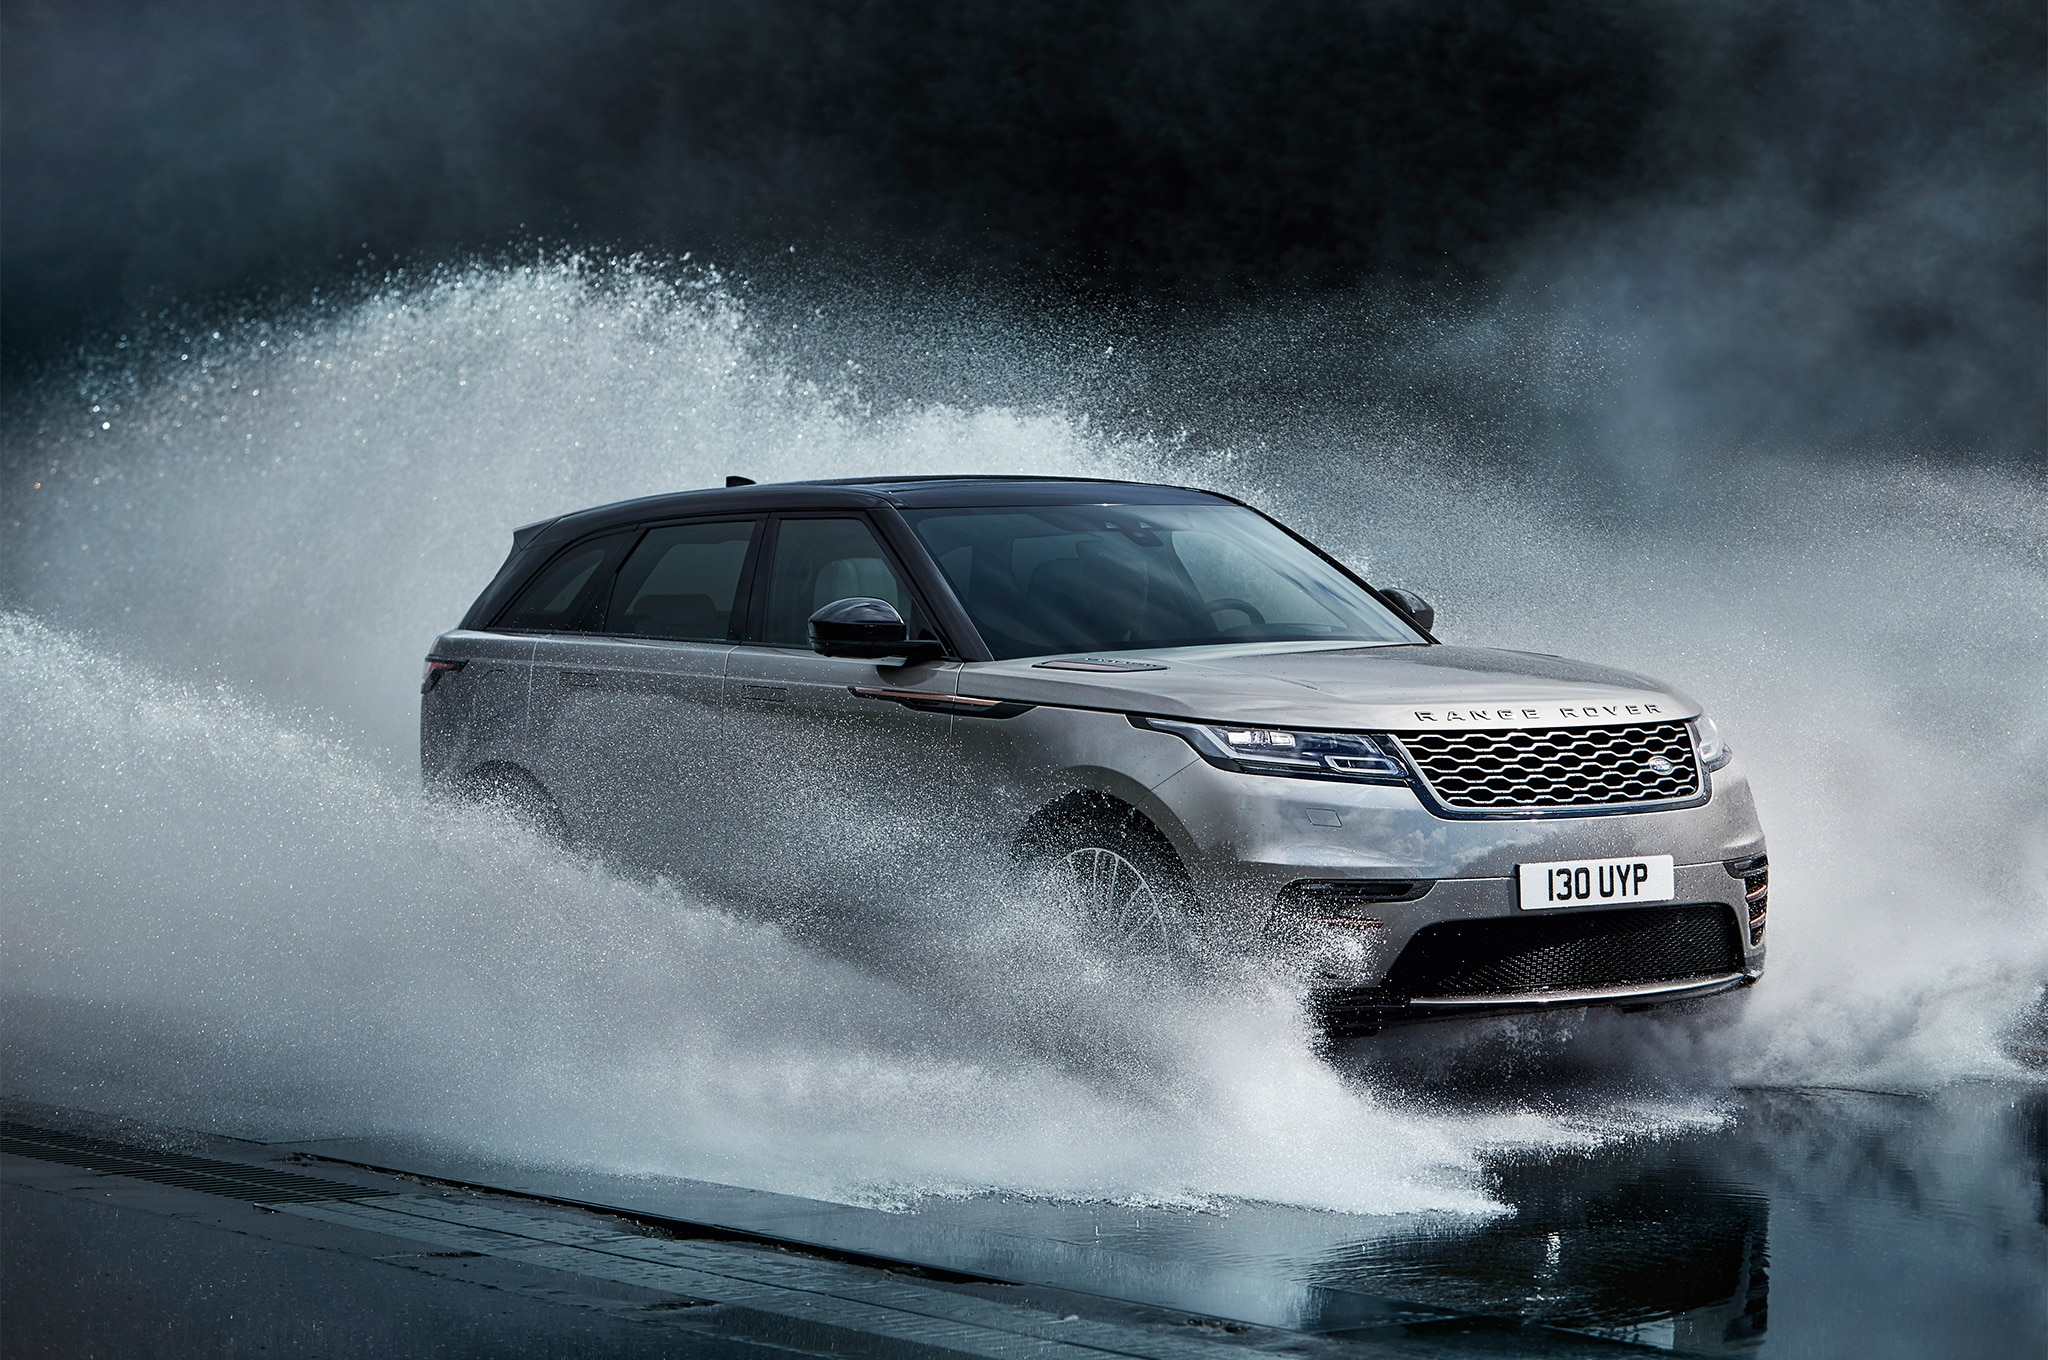 2018 Land Rover Range Rover Velar Front Three Quarter In Water